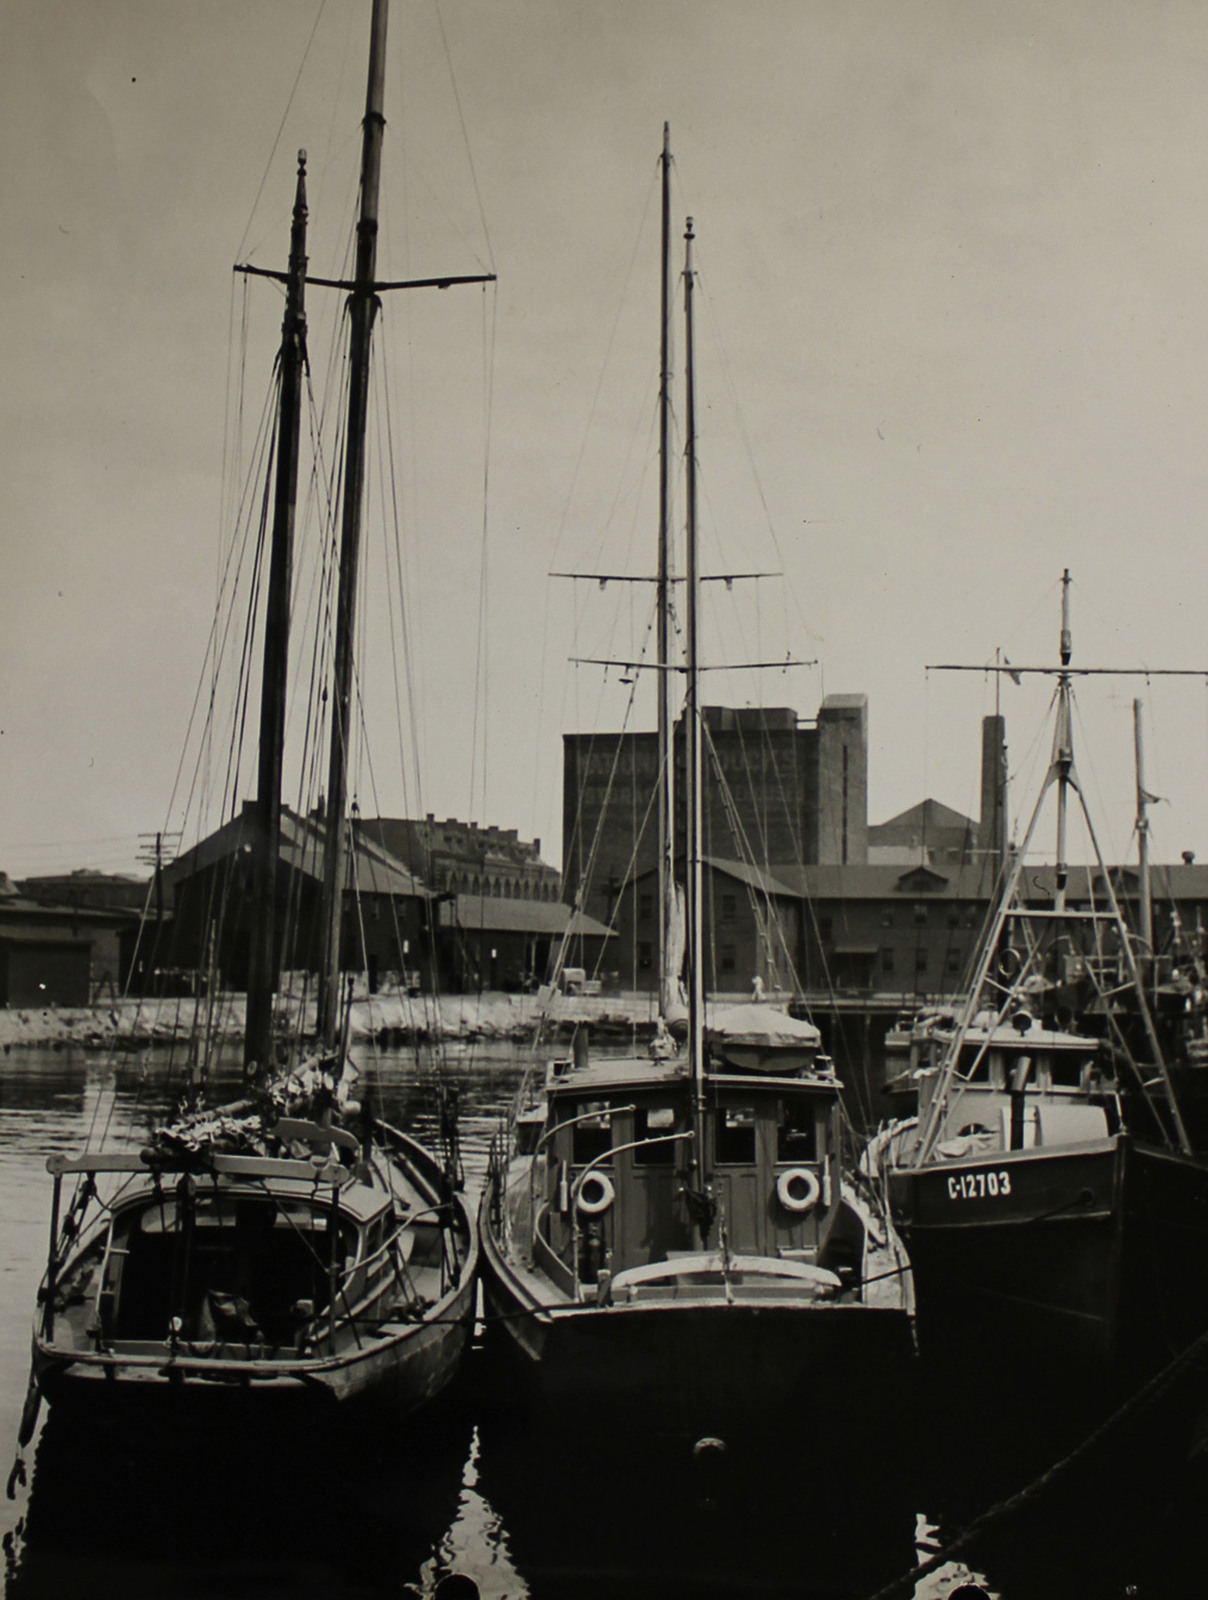 Boats Docked at U.S. Naval Frontier Base, Boston, Massachusetts